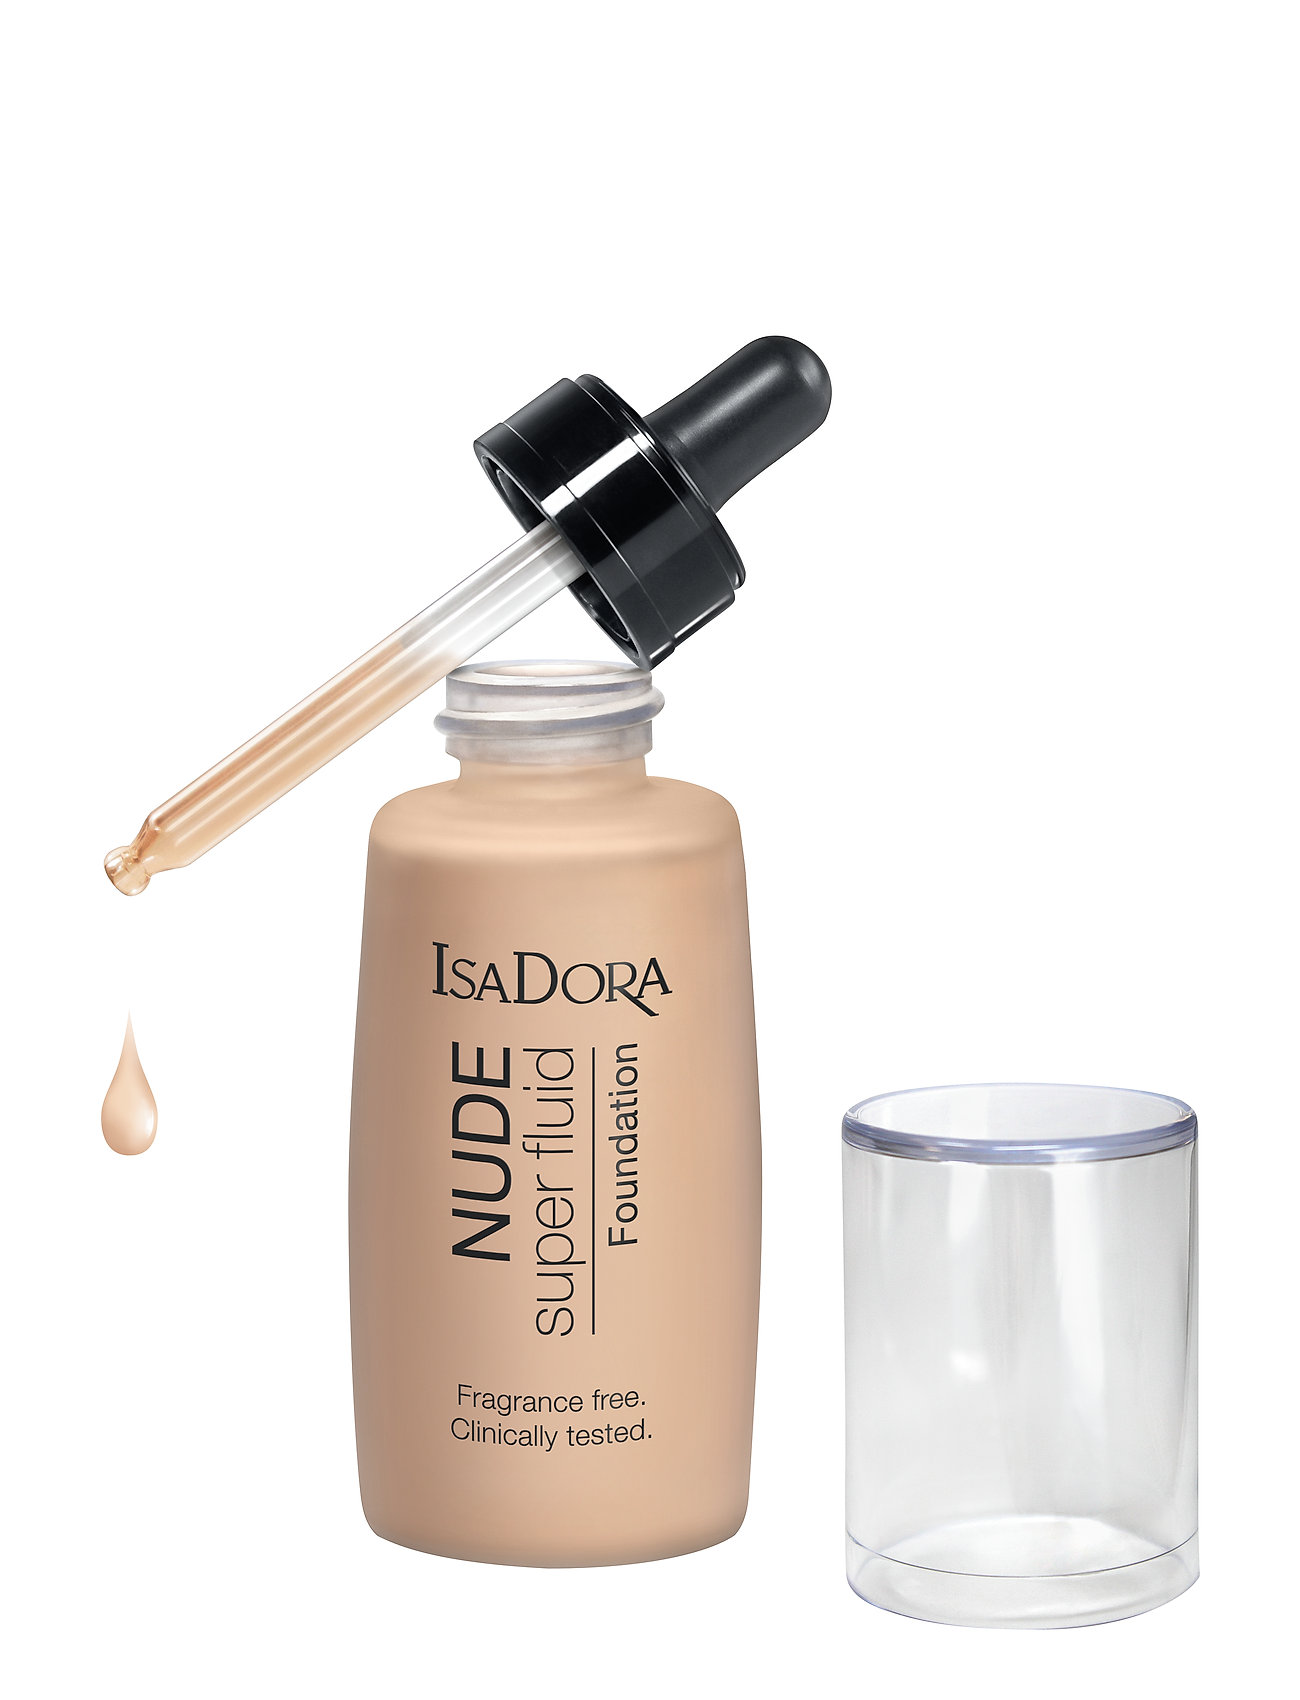 Image of Nude Fluid Foundation 10 Nude Porcelain Foundation Makeup Isadora (3422672087)